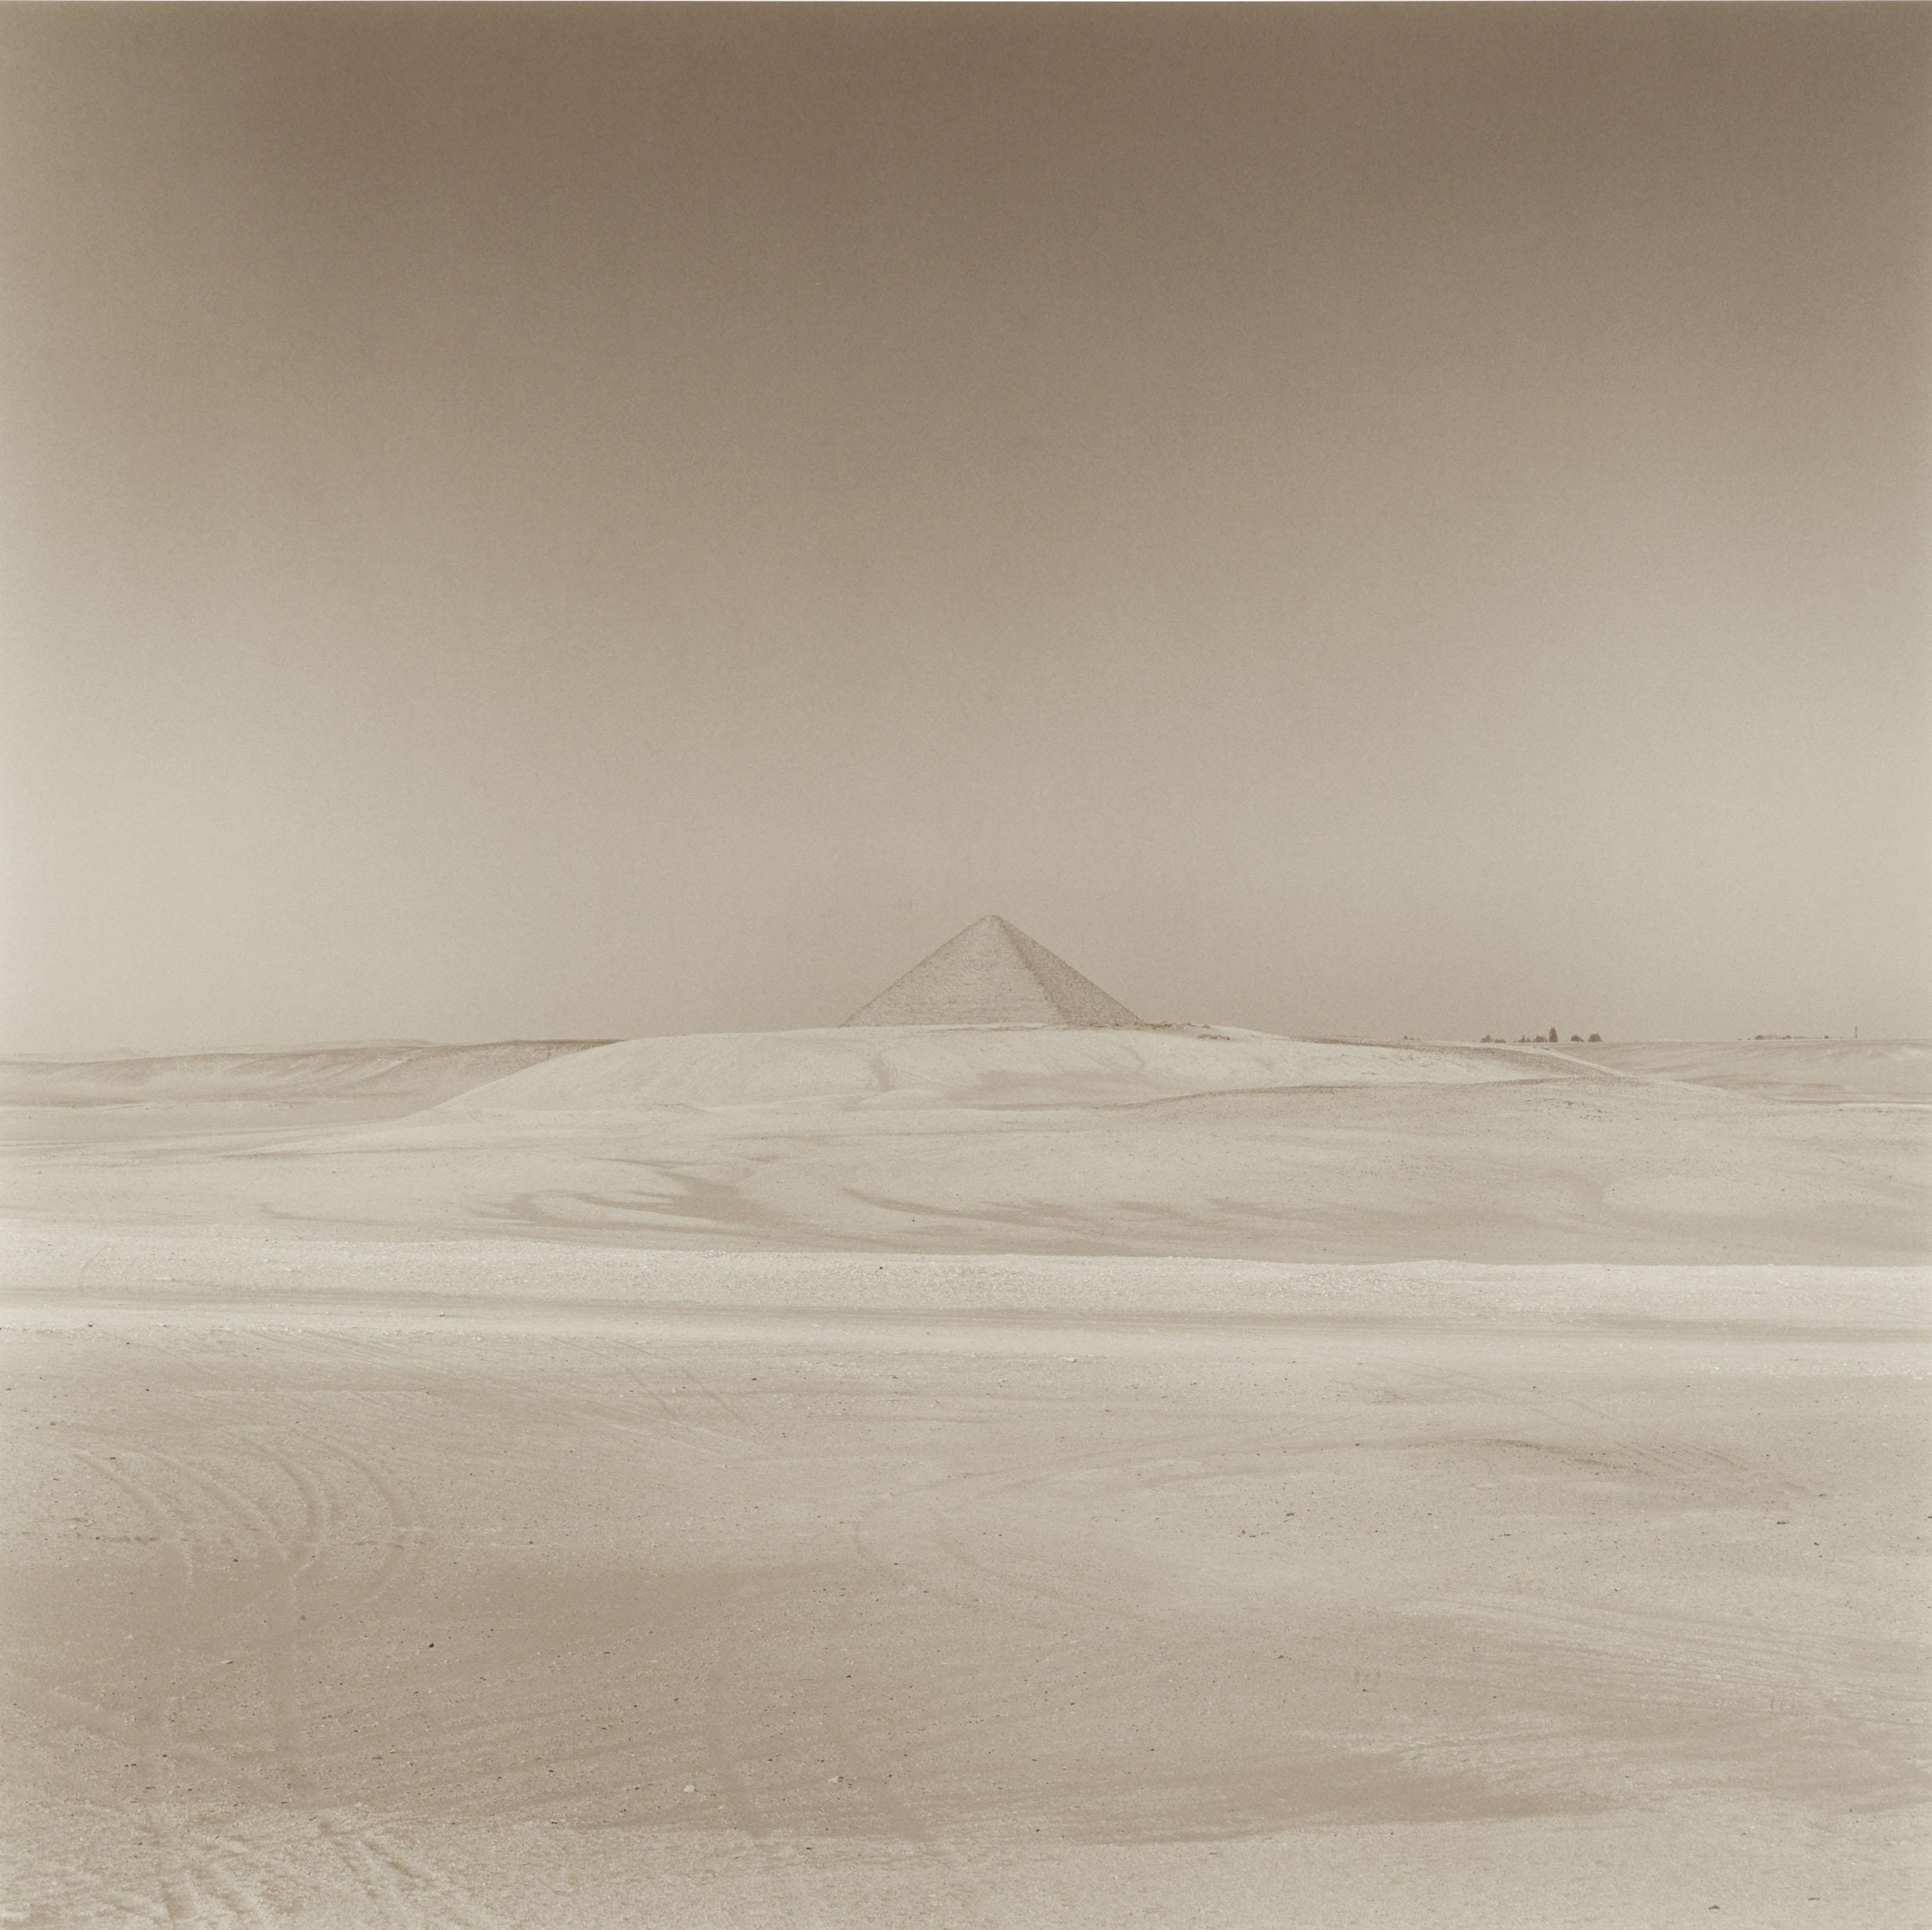 Africa #16, Red Pyramid, Dashur, Egypt, 1997